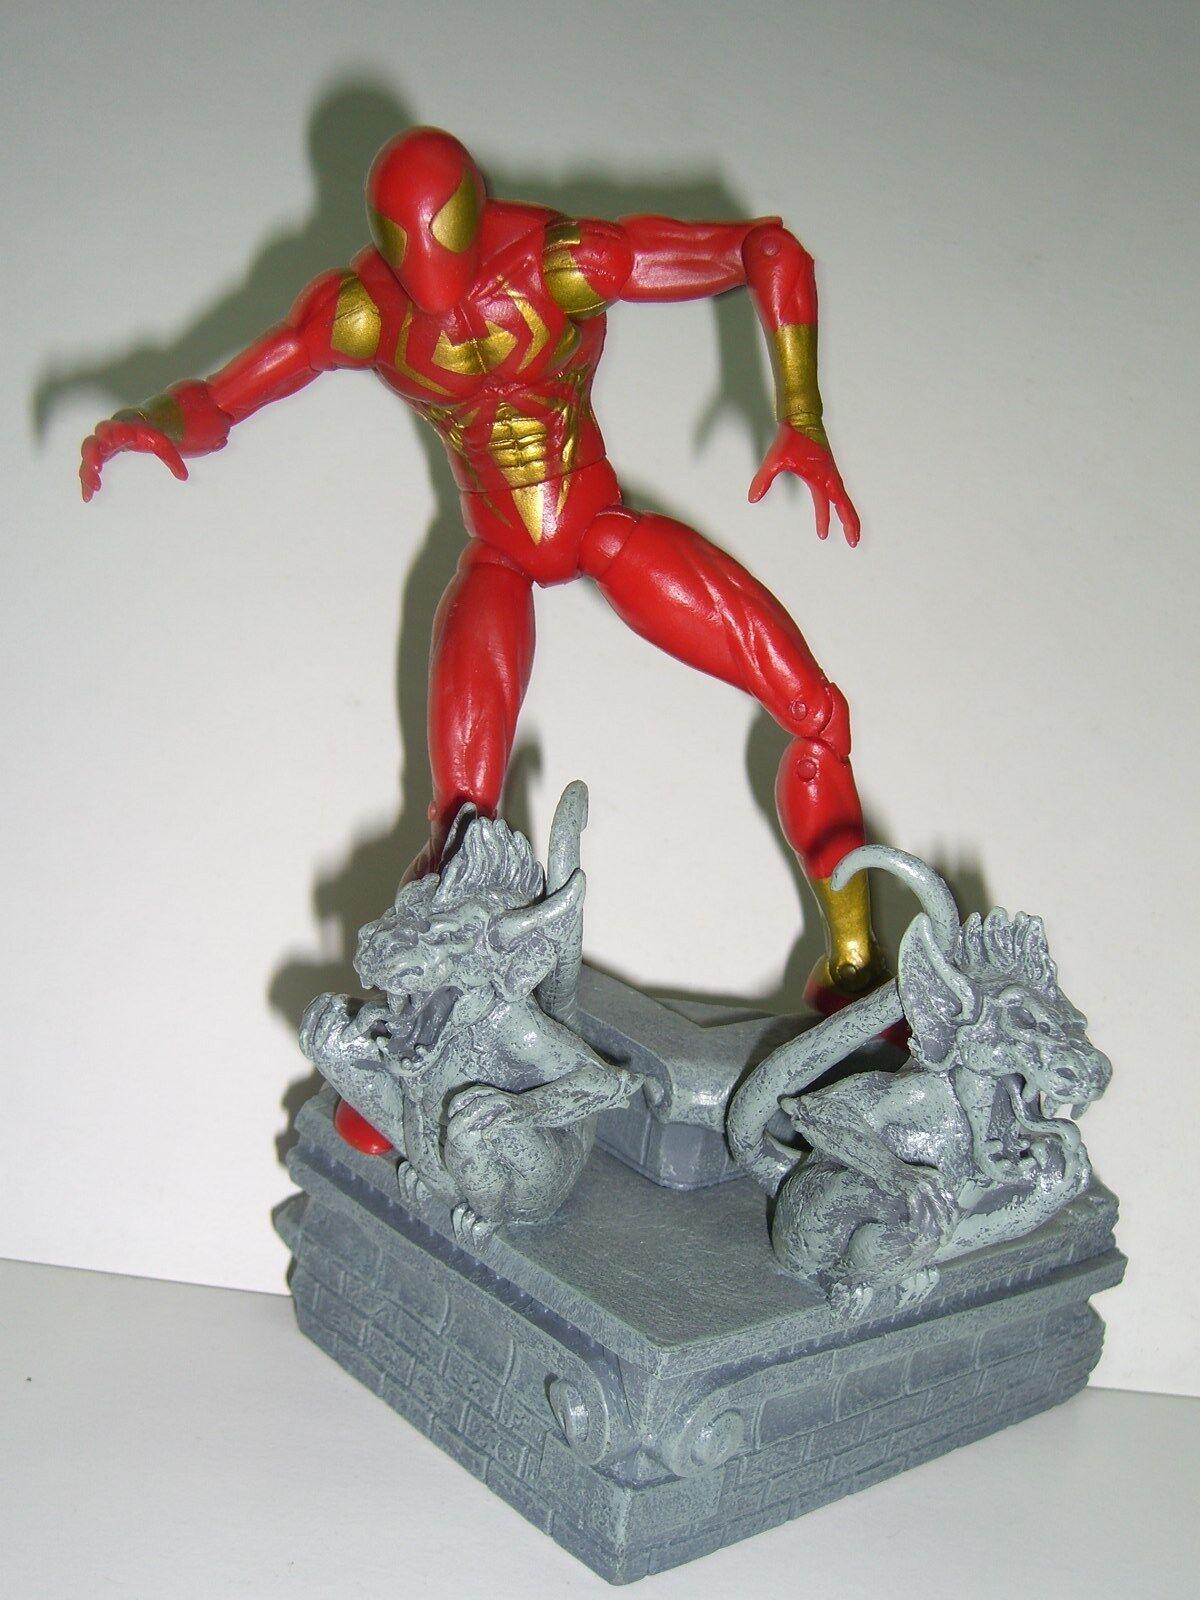 MARVEL SELECT Iron Spider-Man guerre civile Assistant EXCLUSIVE TOY BIZ Figure + Base